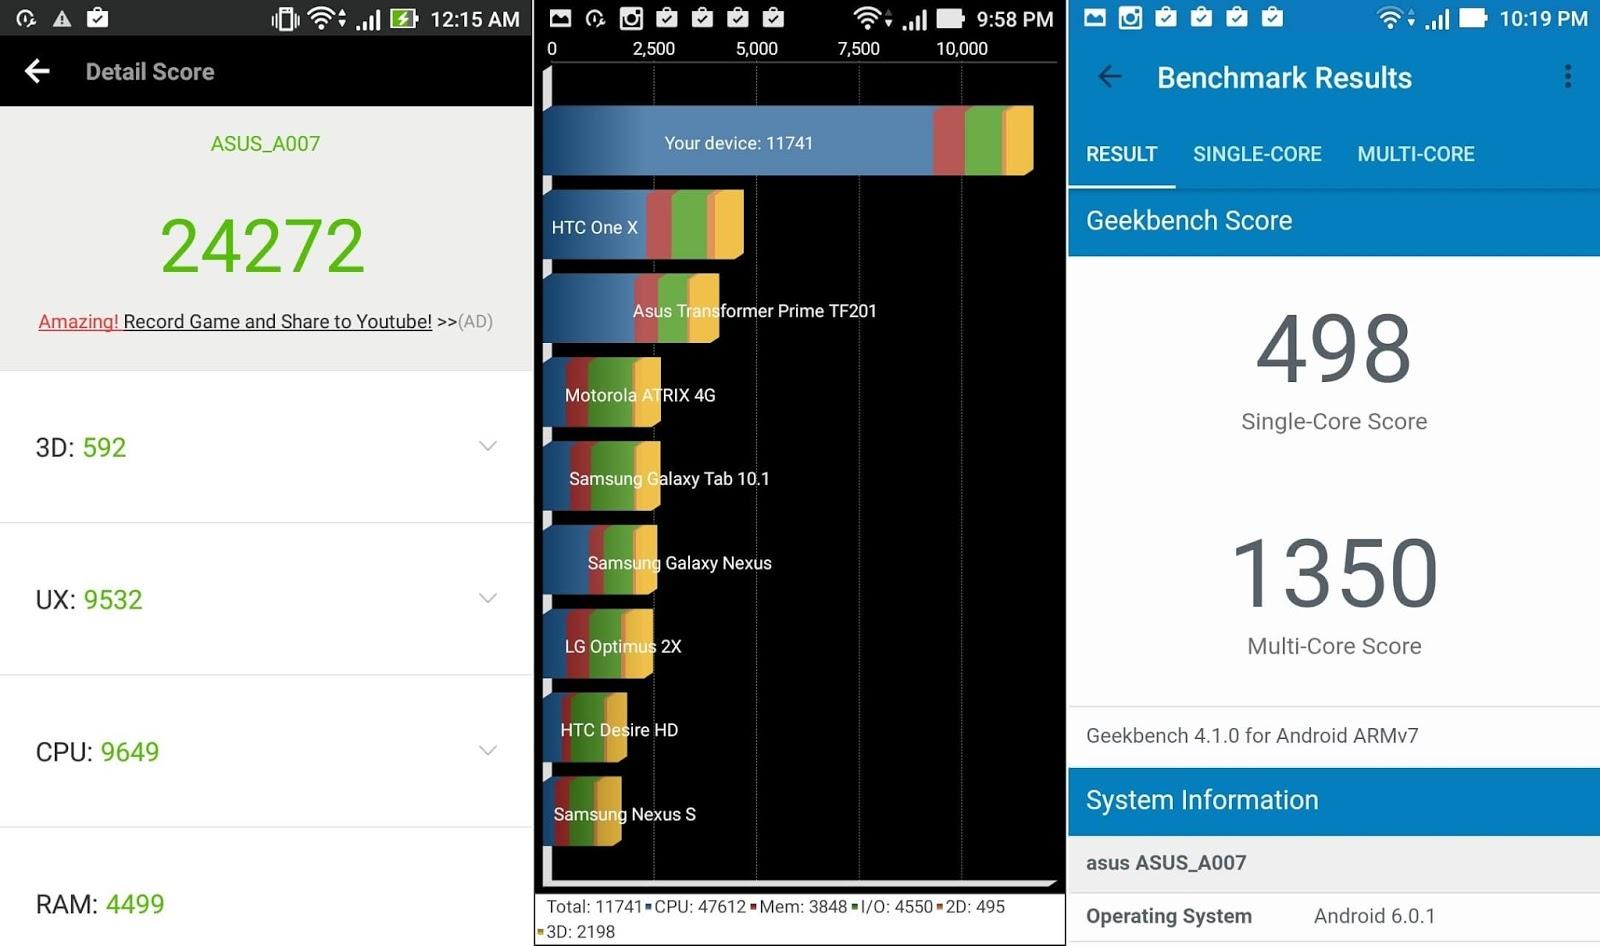 ASUS ZenFone Live Benchmark Scores